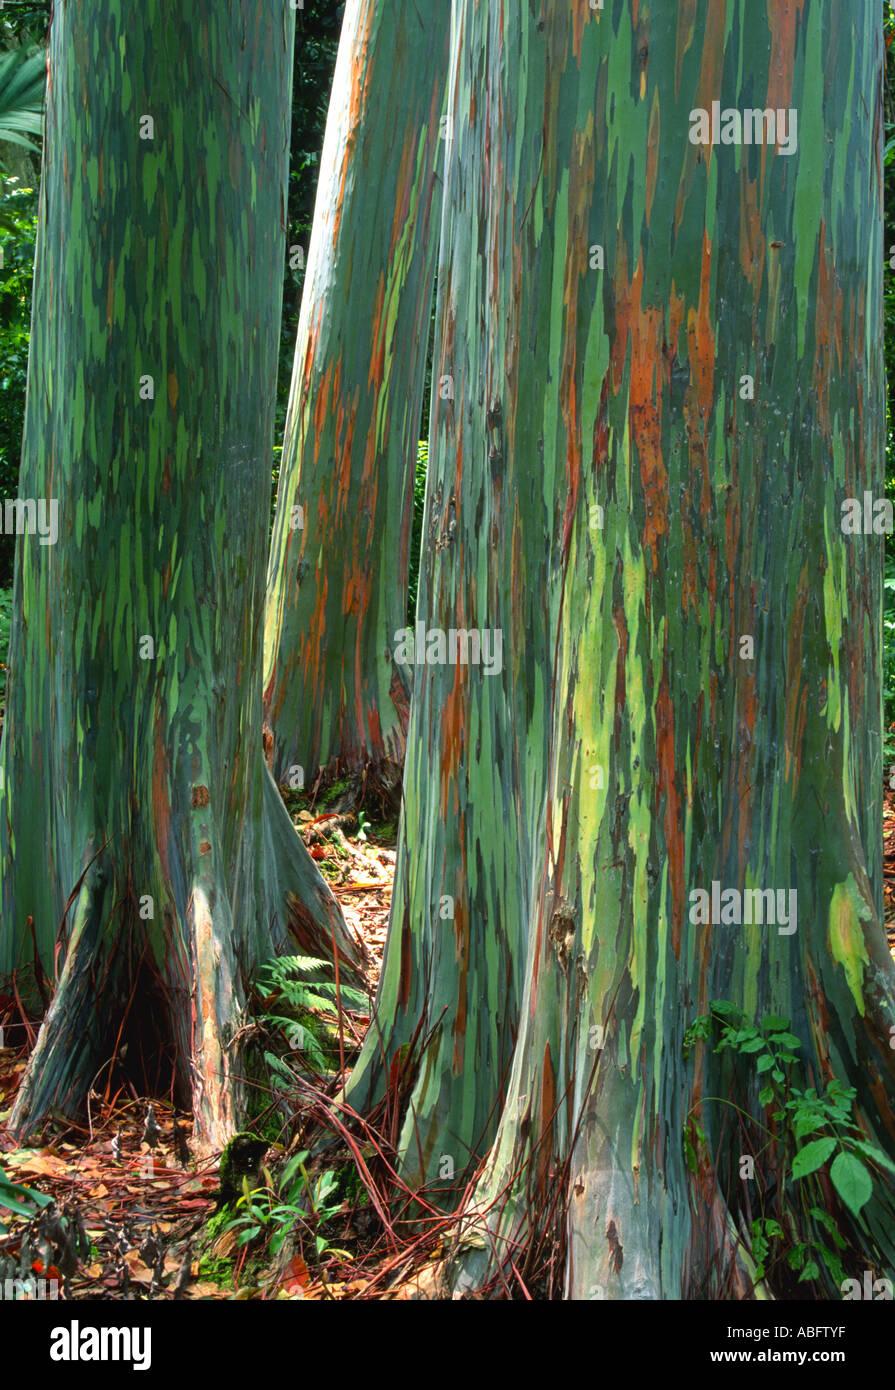 Eucalyptus deglupta is a tall tree, commonly known as the rainbow eucalyptus, Mindanao gum, or rainbow gum from Indonesia. - Stock Image